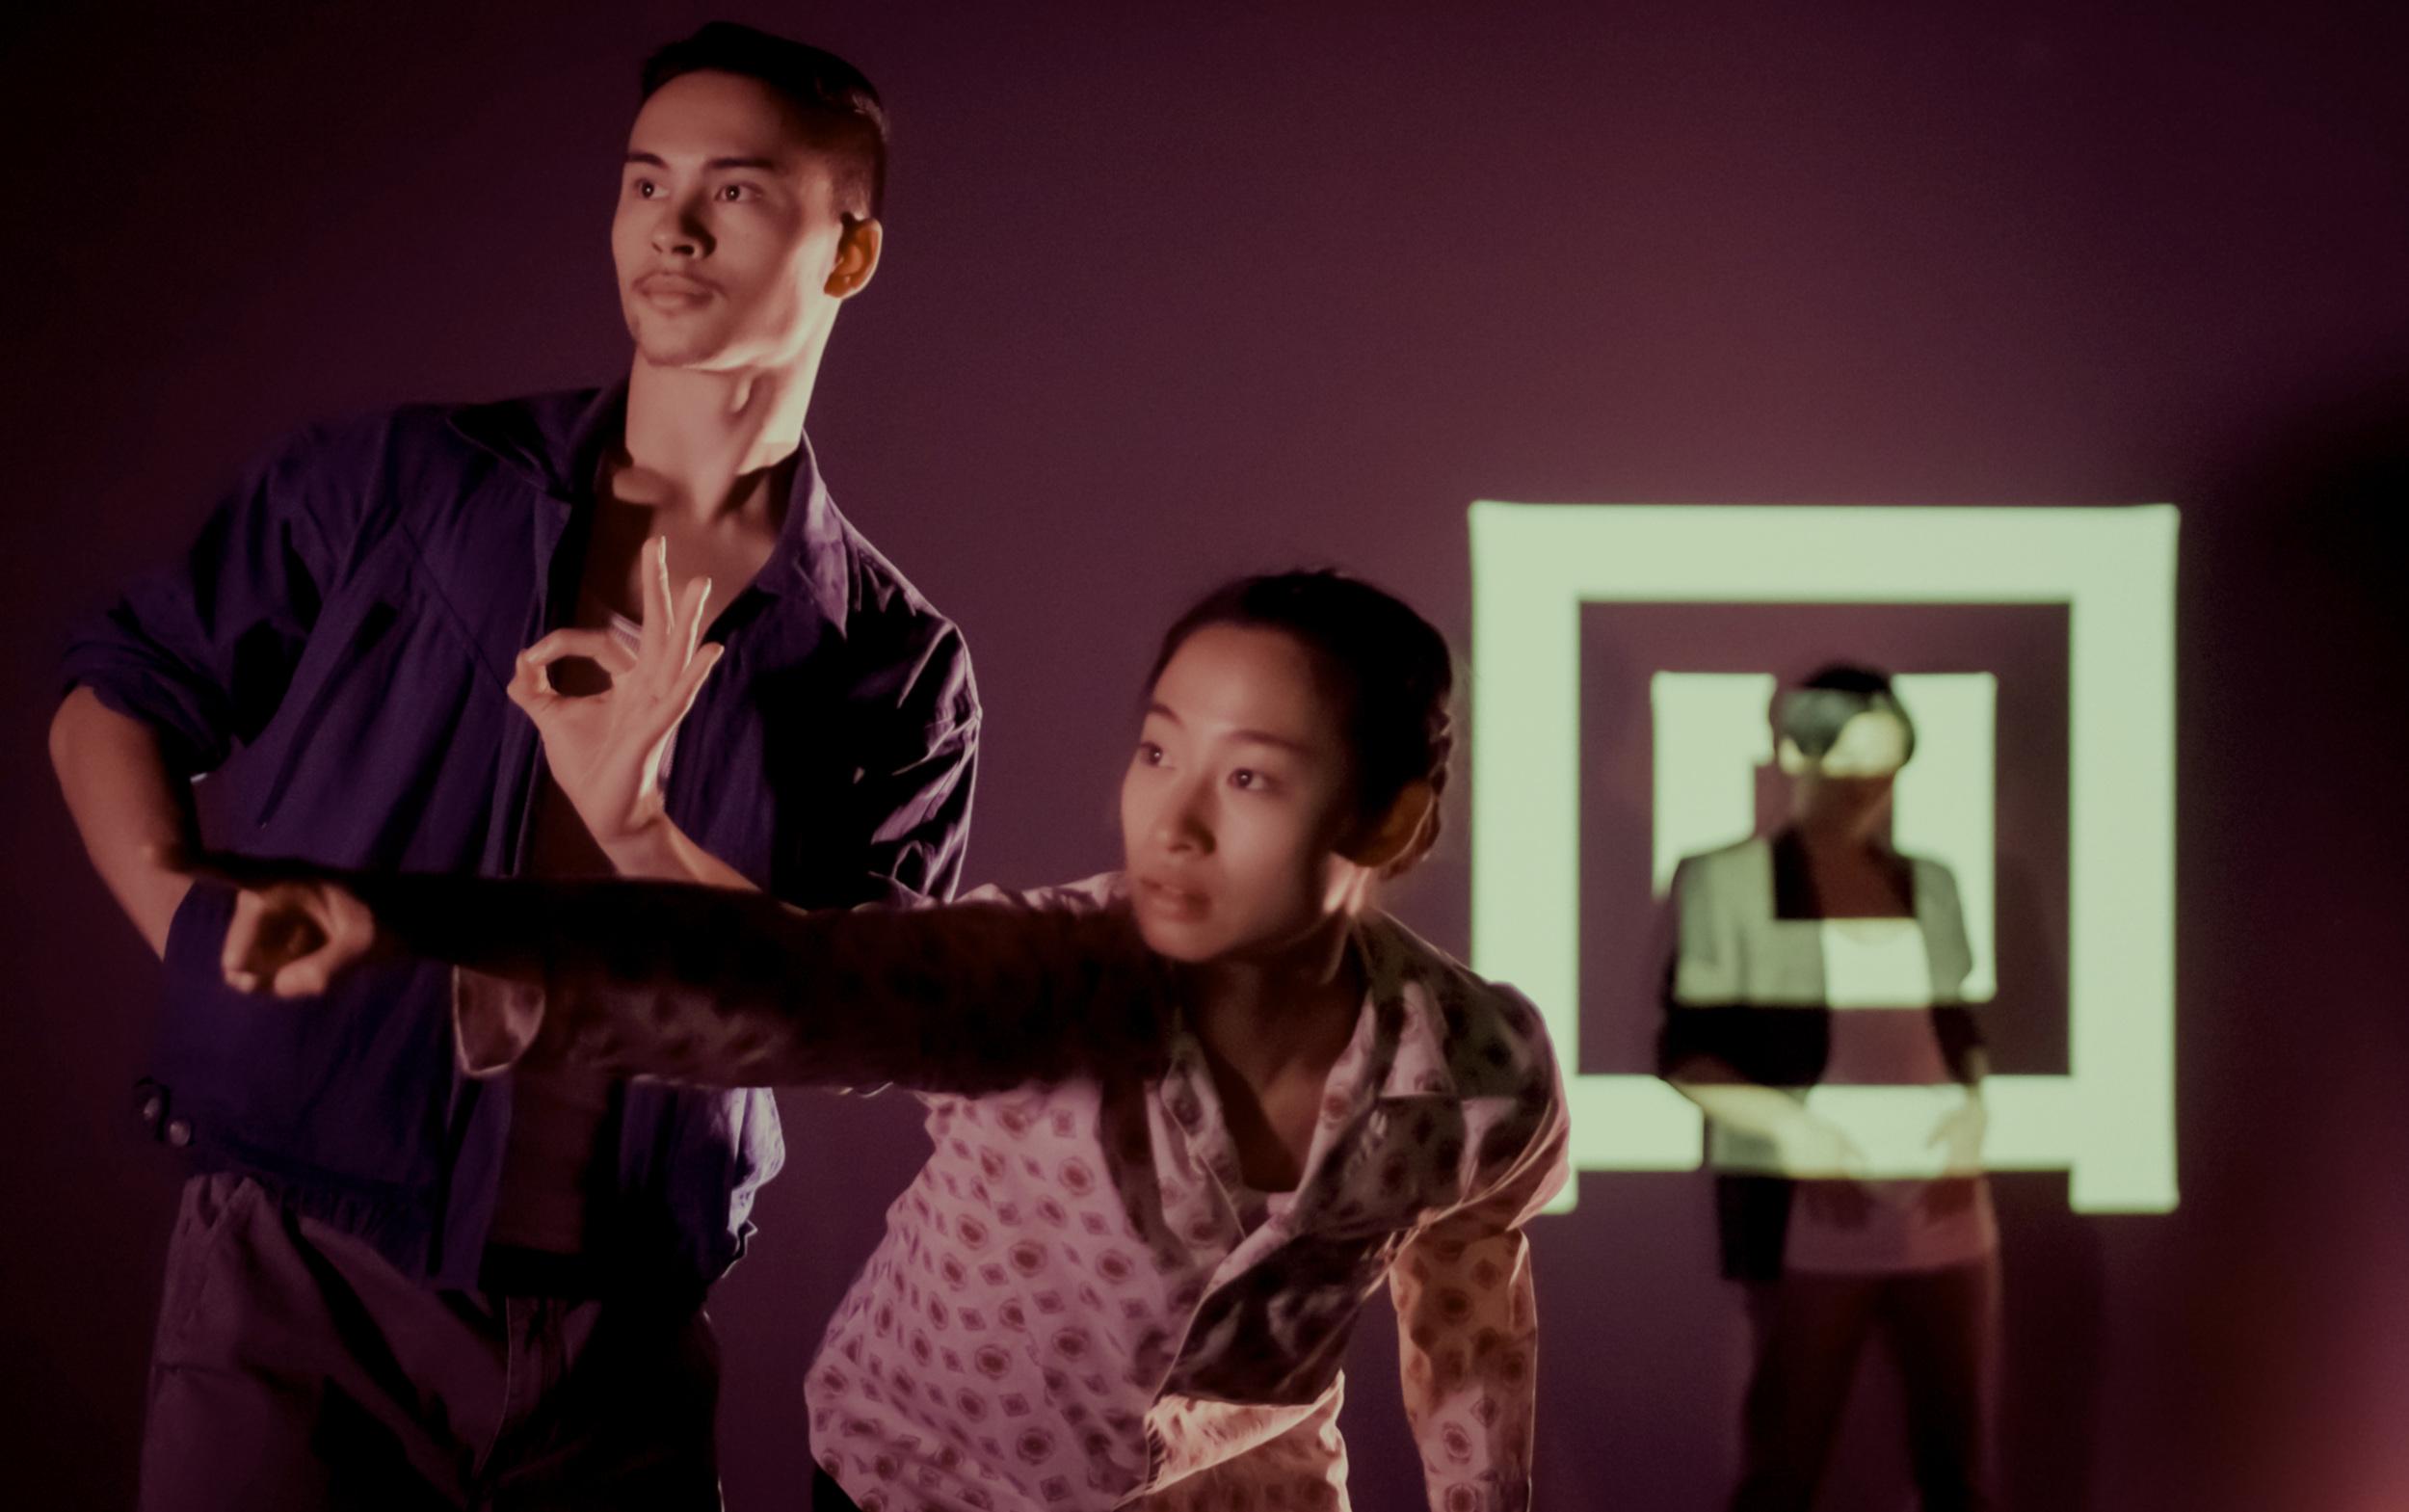 HKX+-+NINEEIGHT+Promotional+Photo+1.jpg